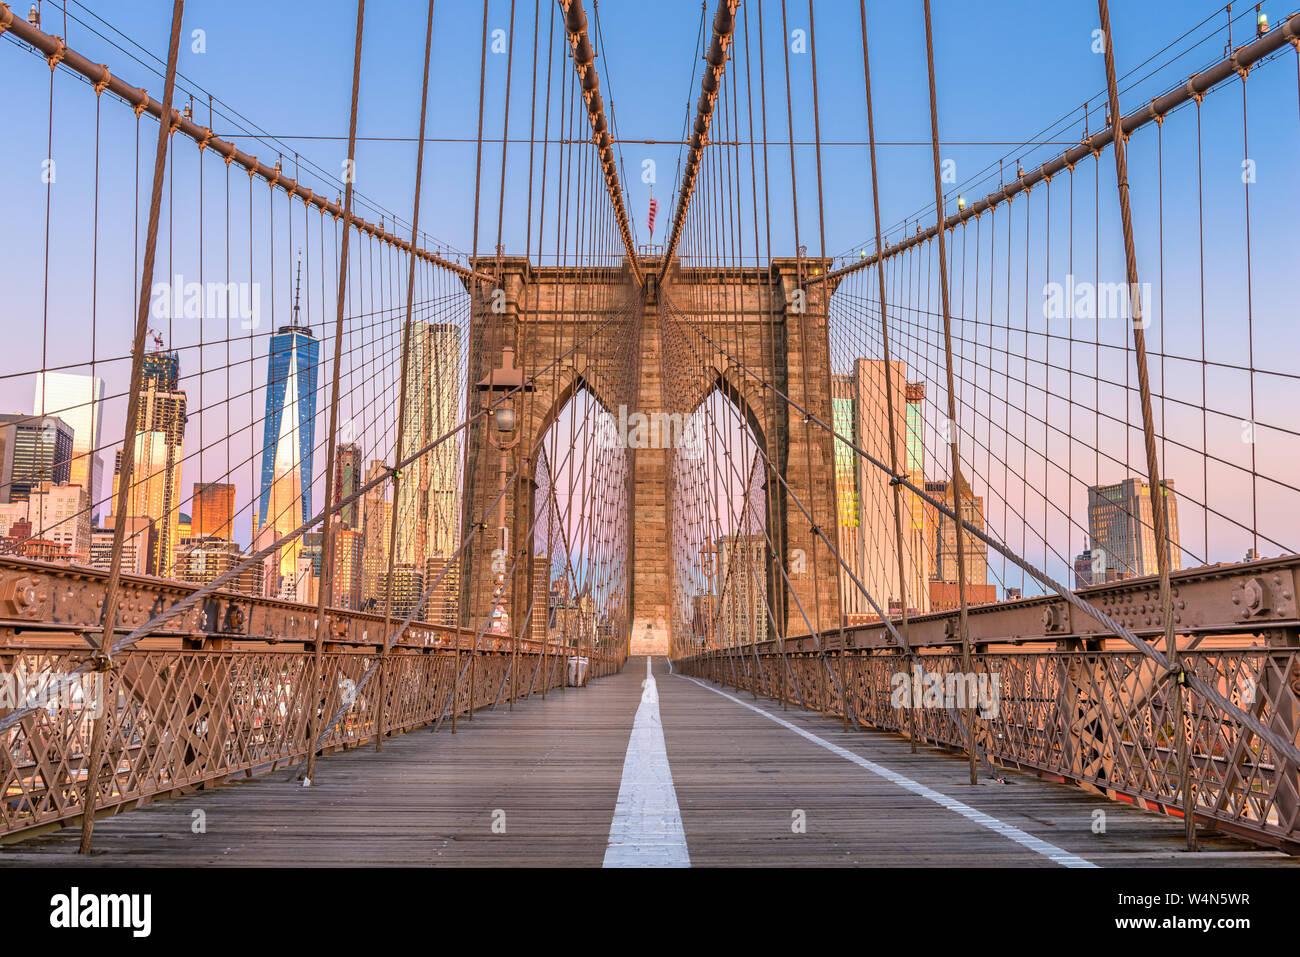 Brooklyn Bridge Promenade with the New York City skyline. Stock Photo